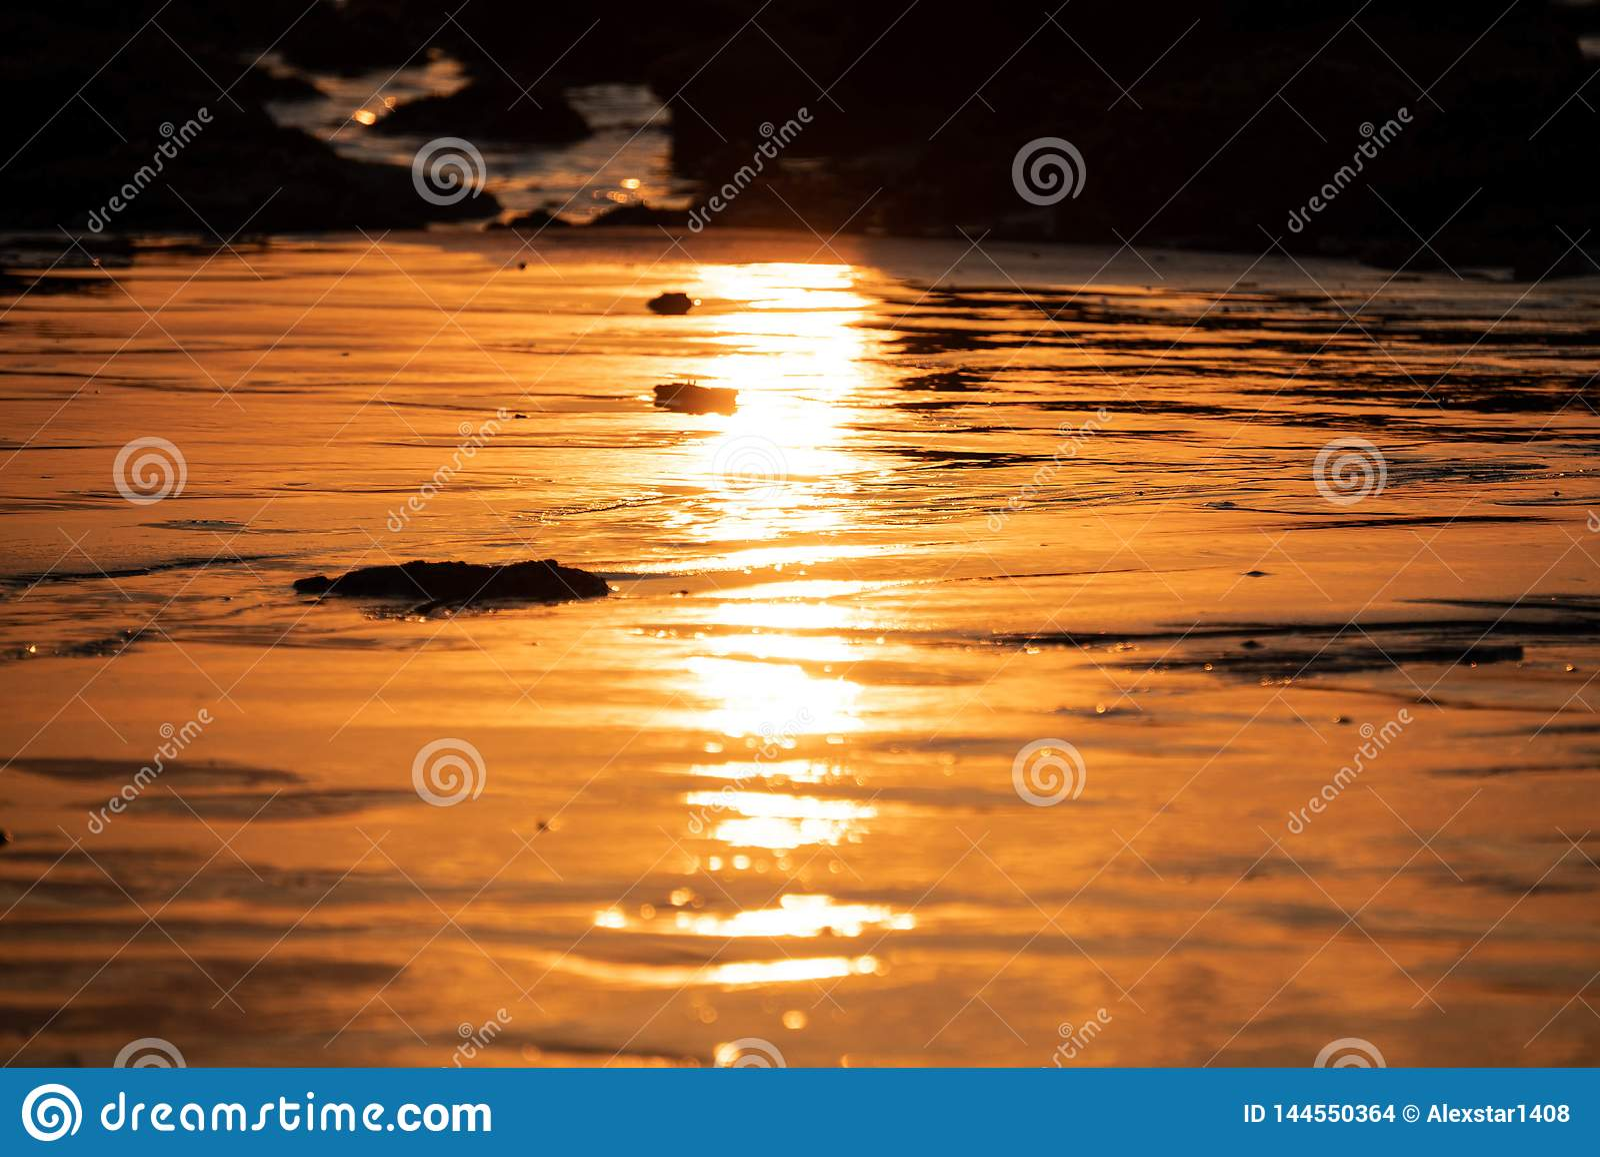 Thailand Sunset reflection on the beach